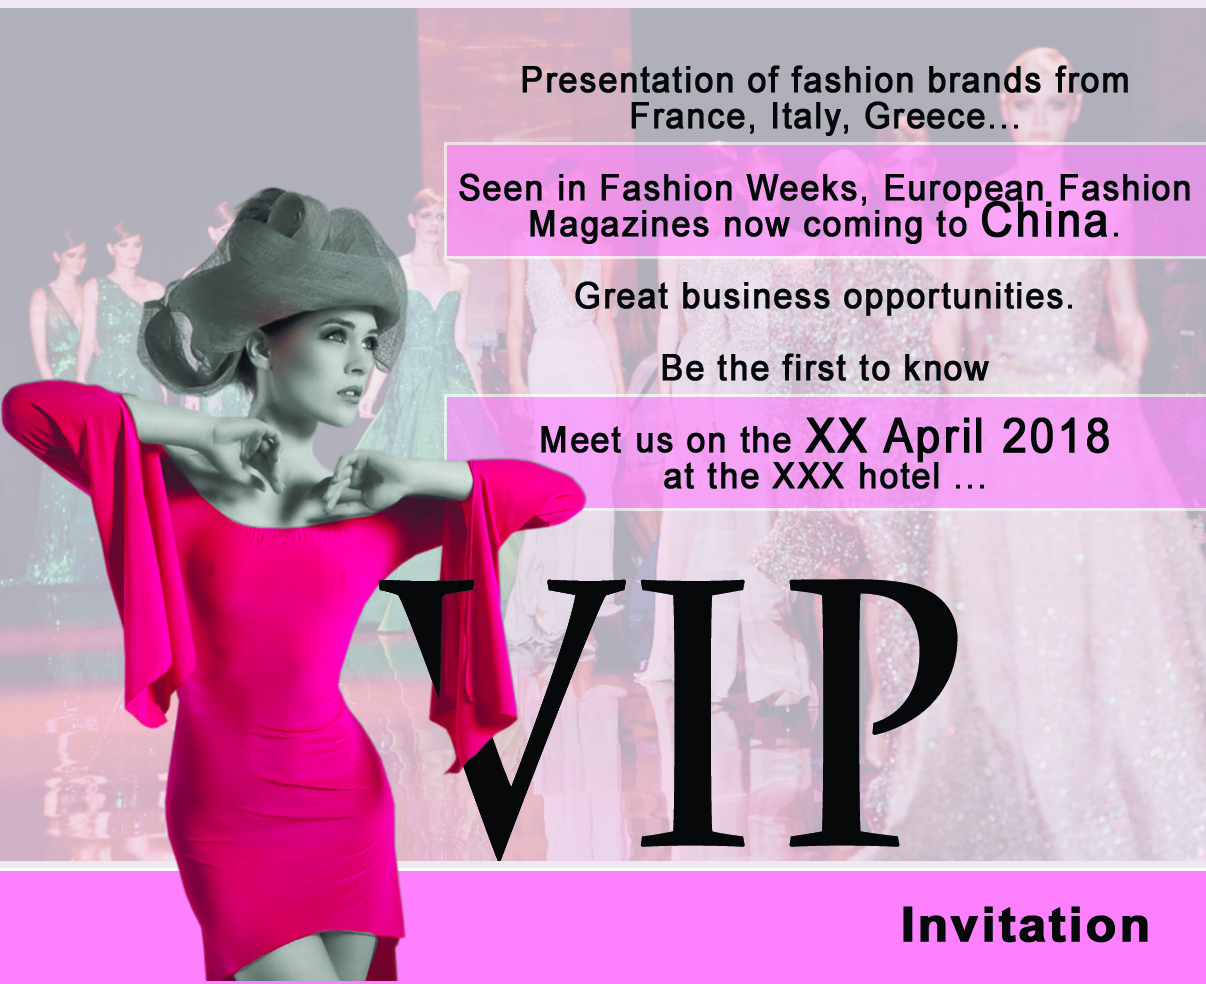 Флаер для модного мероприятия фото f_9685a6e0e1ad2c07.jpg